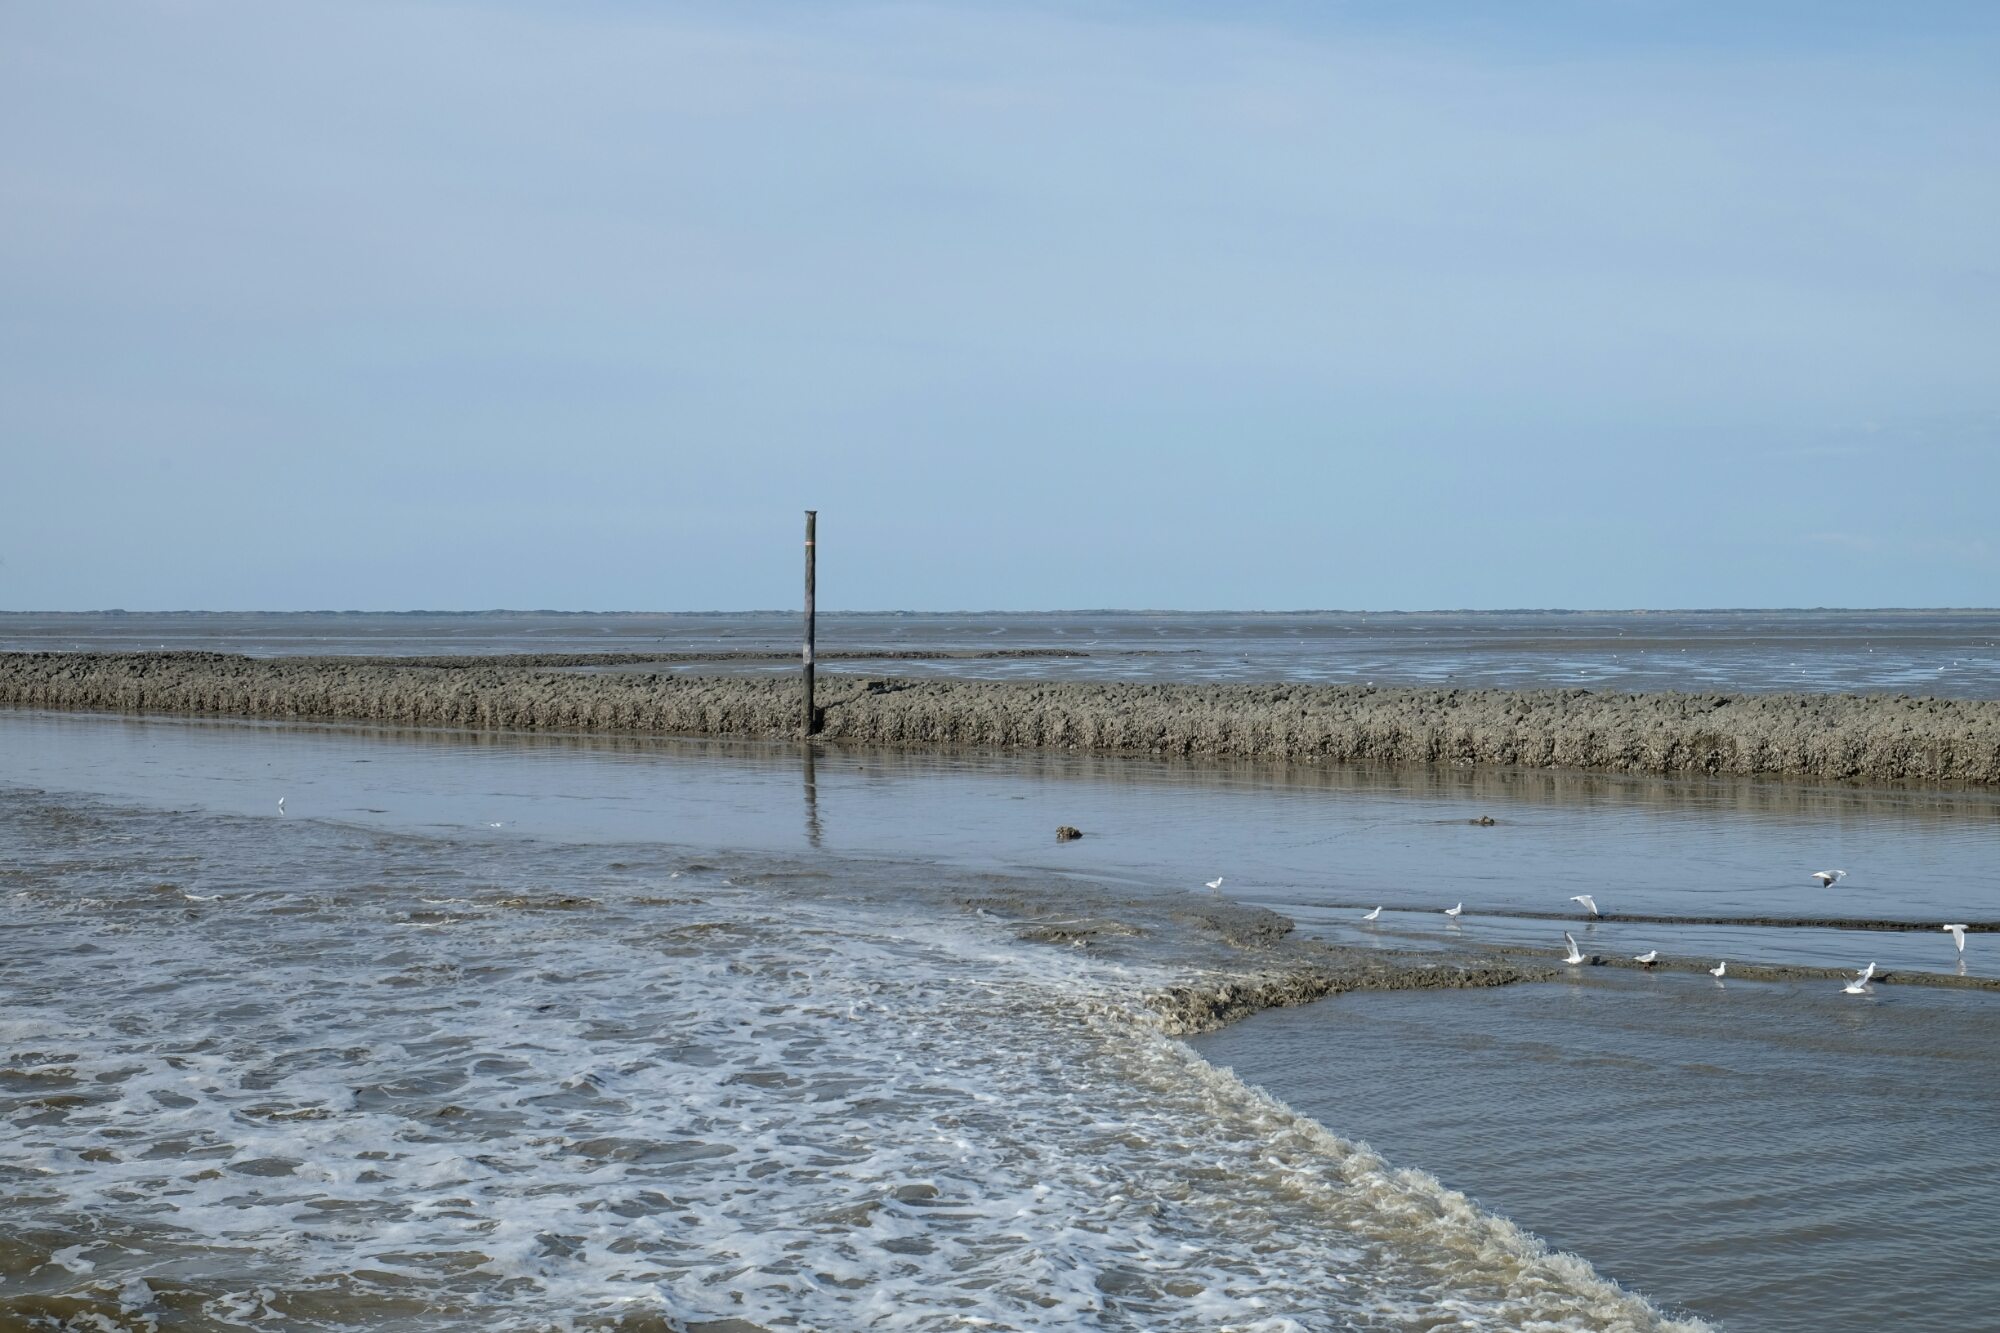 Niedrigwasser bei Bensersiel